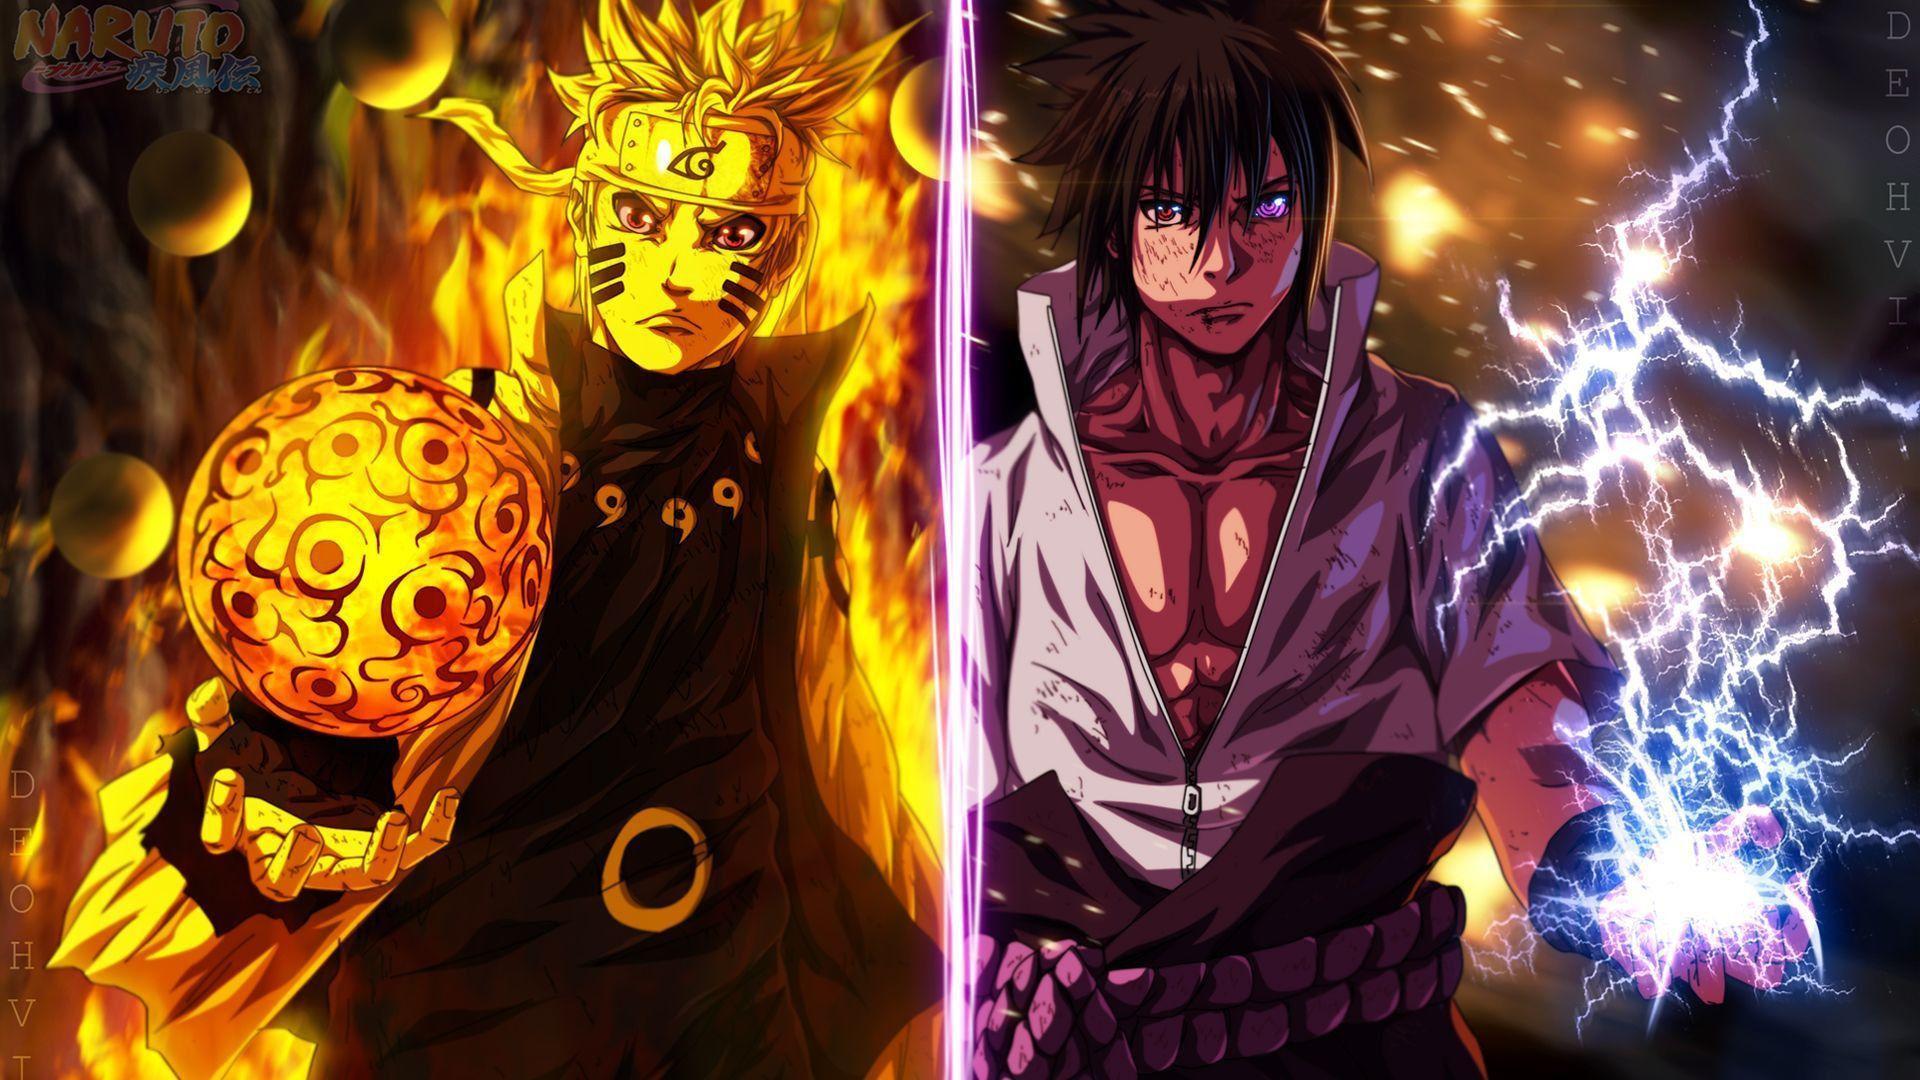 Dual Screen Naruto Wallpapers - Top Free Dual Screen ...